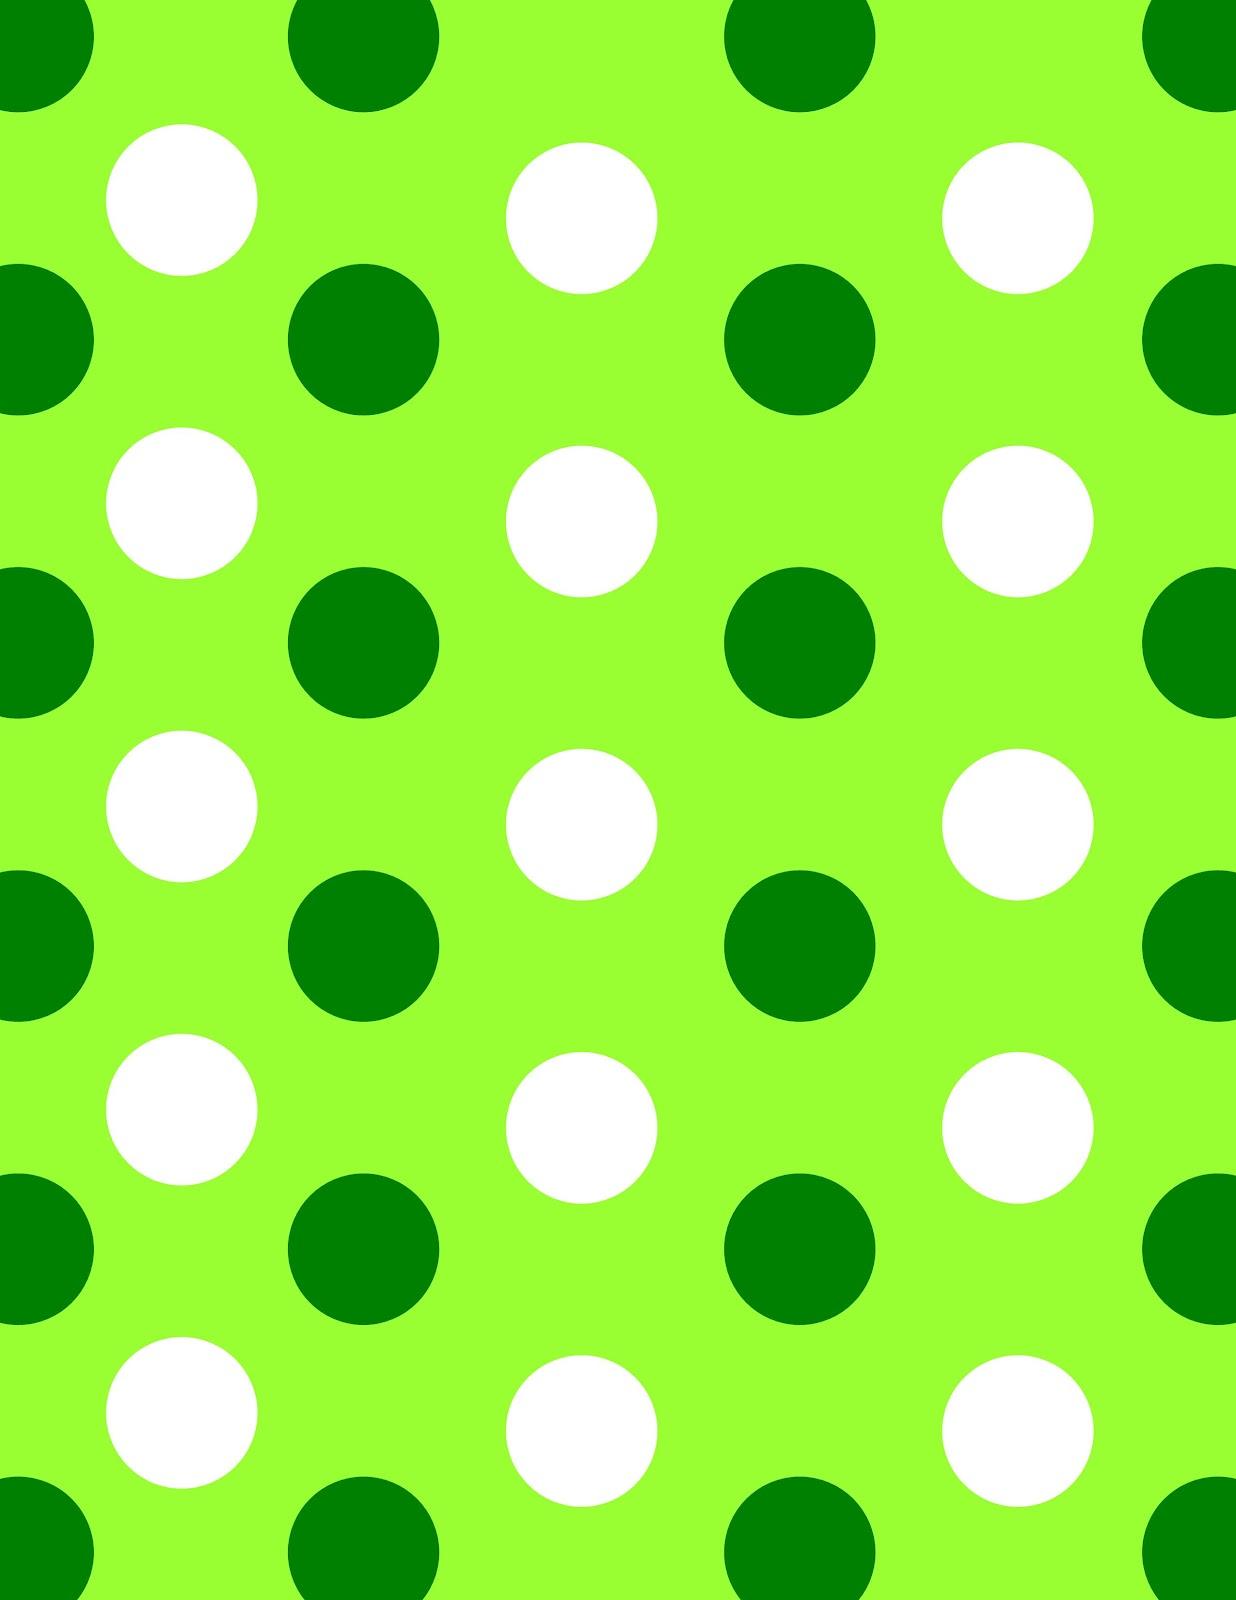 Pictures polka dot wallpaper 13 wallpaper background hd wallpaper